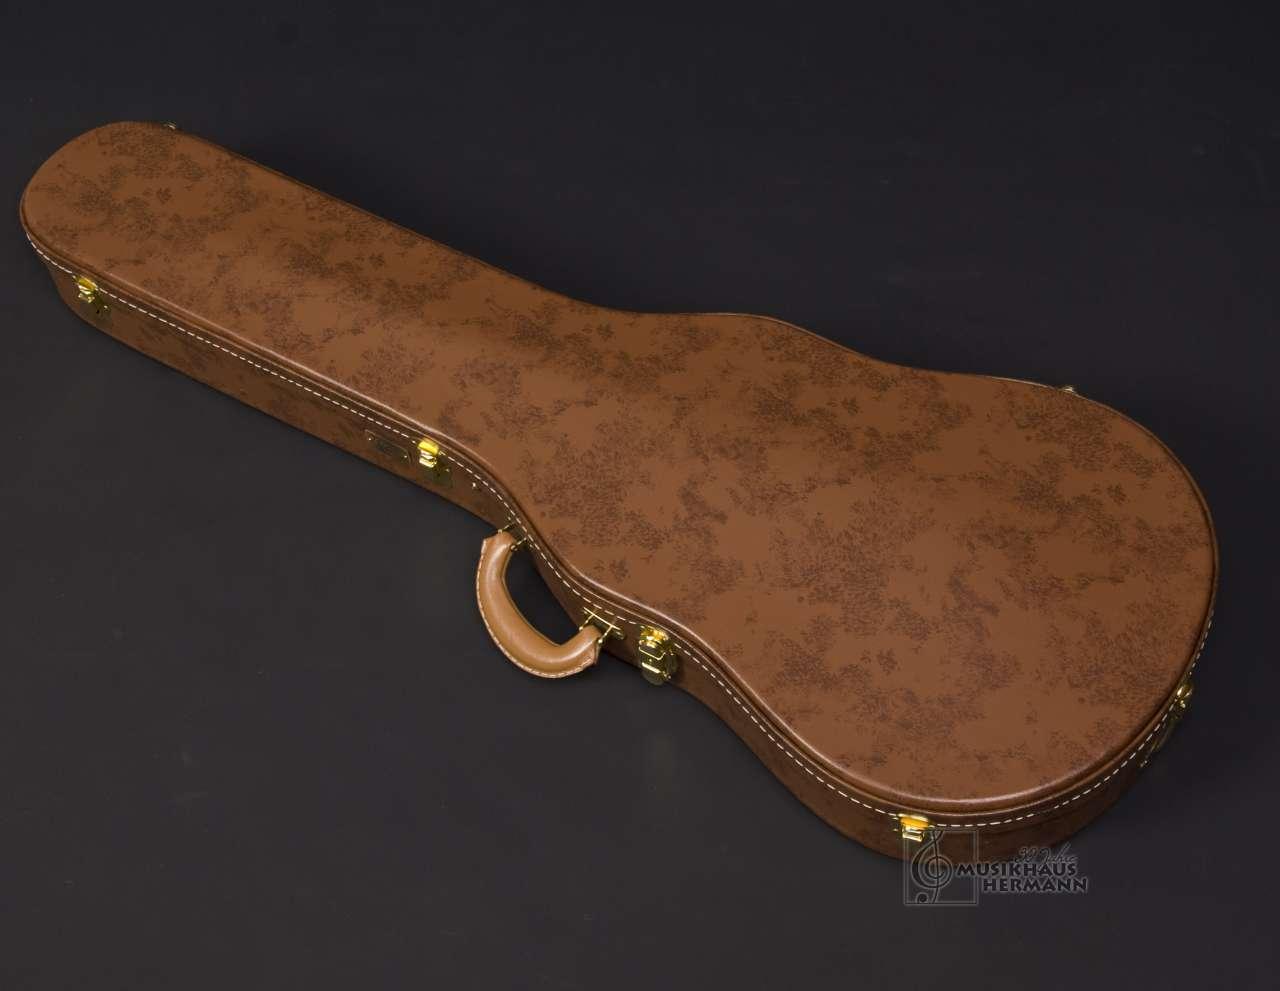 Koffer E-Gitarre Gibson Custom Shop braun - Les Paul Modelle ASCSCASE-NA